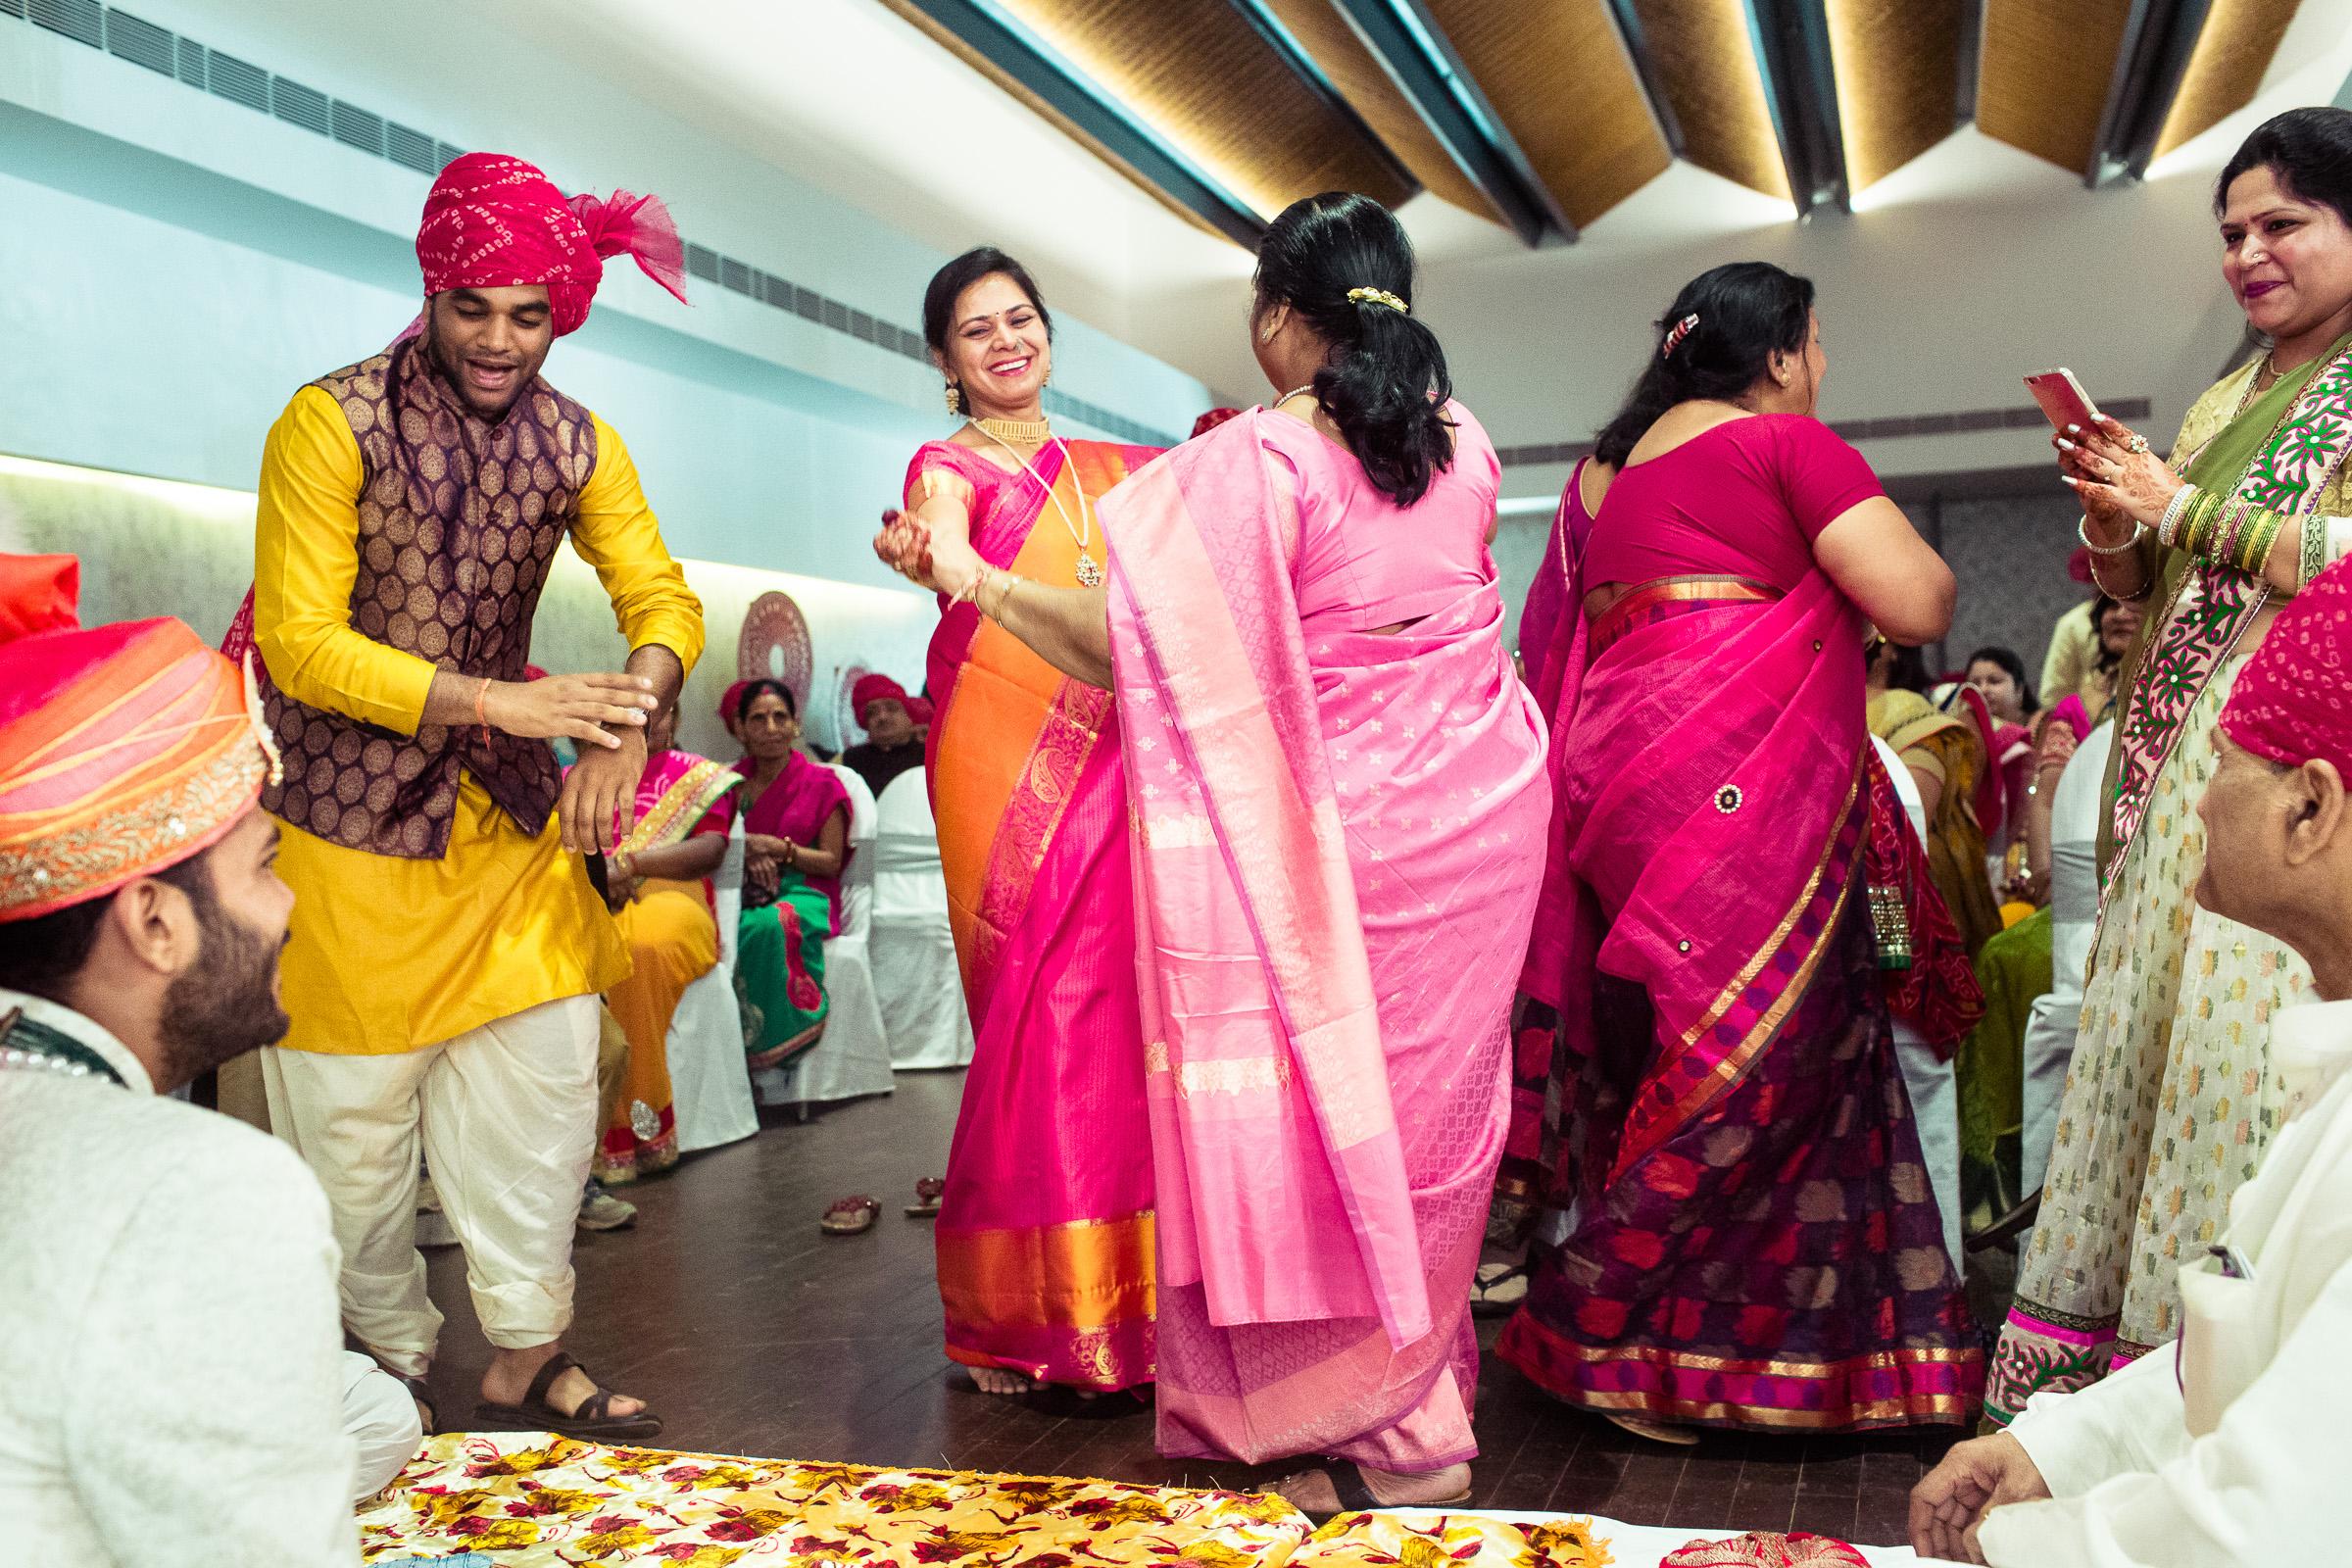 marwari-candid-wedding-photographers-bangalore-0014.jpg